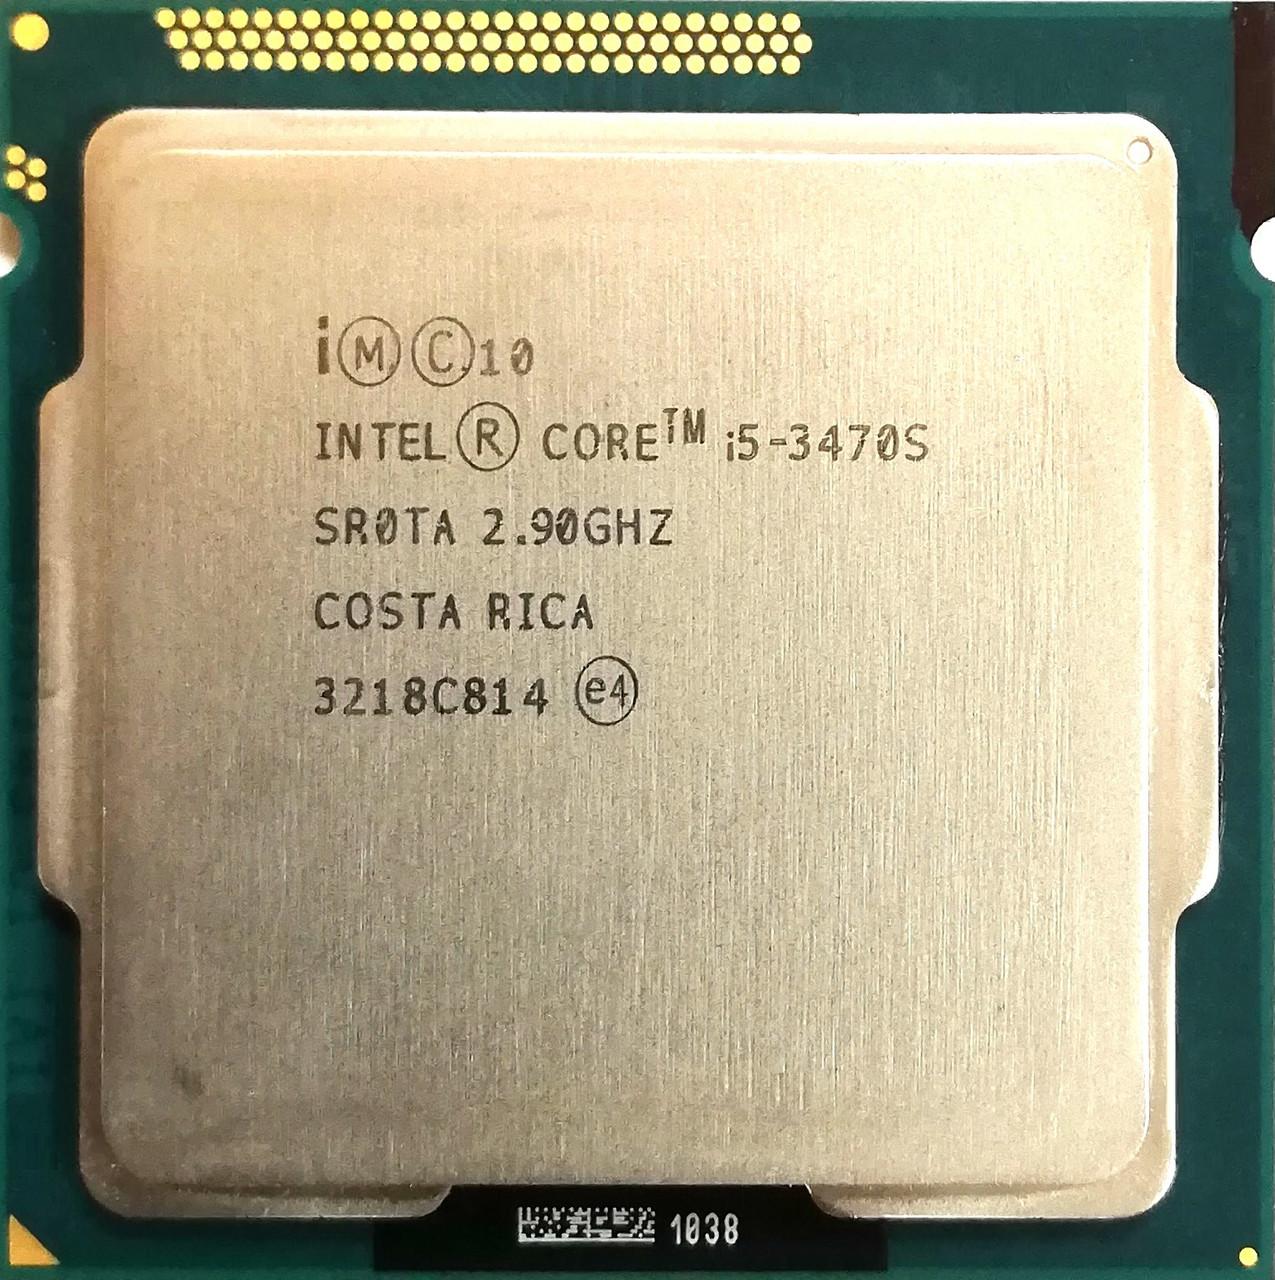 Процессор Intel Core i5-3470S N0 SR0TA 2.9GHz up 3.6GHz 6M Cache Socket 1155 Б/У